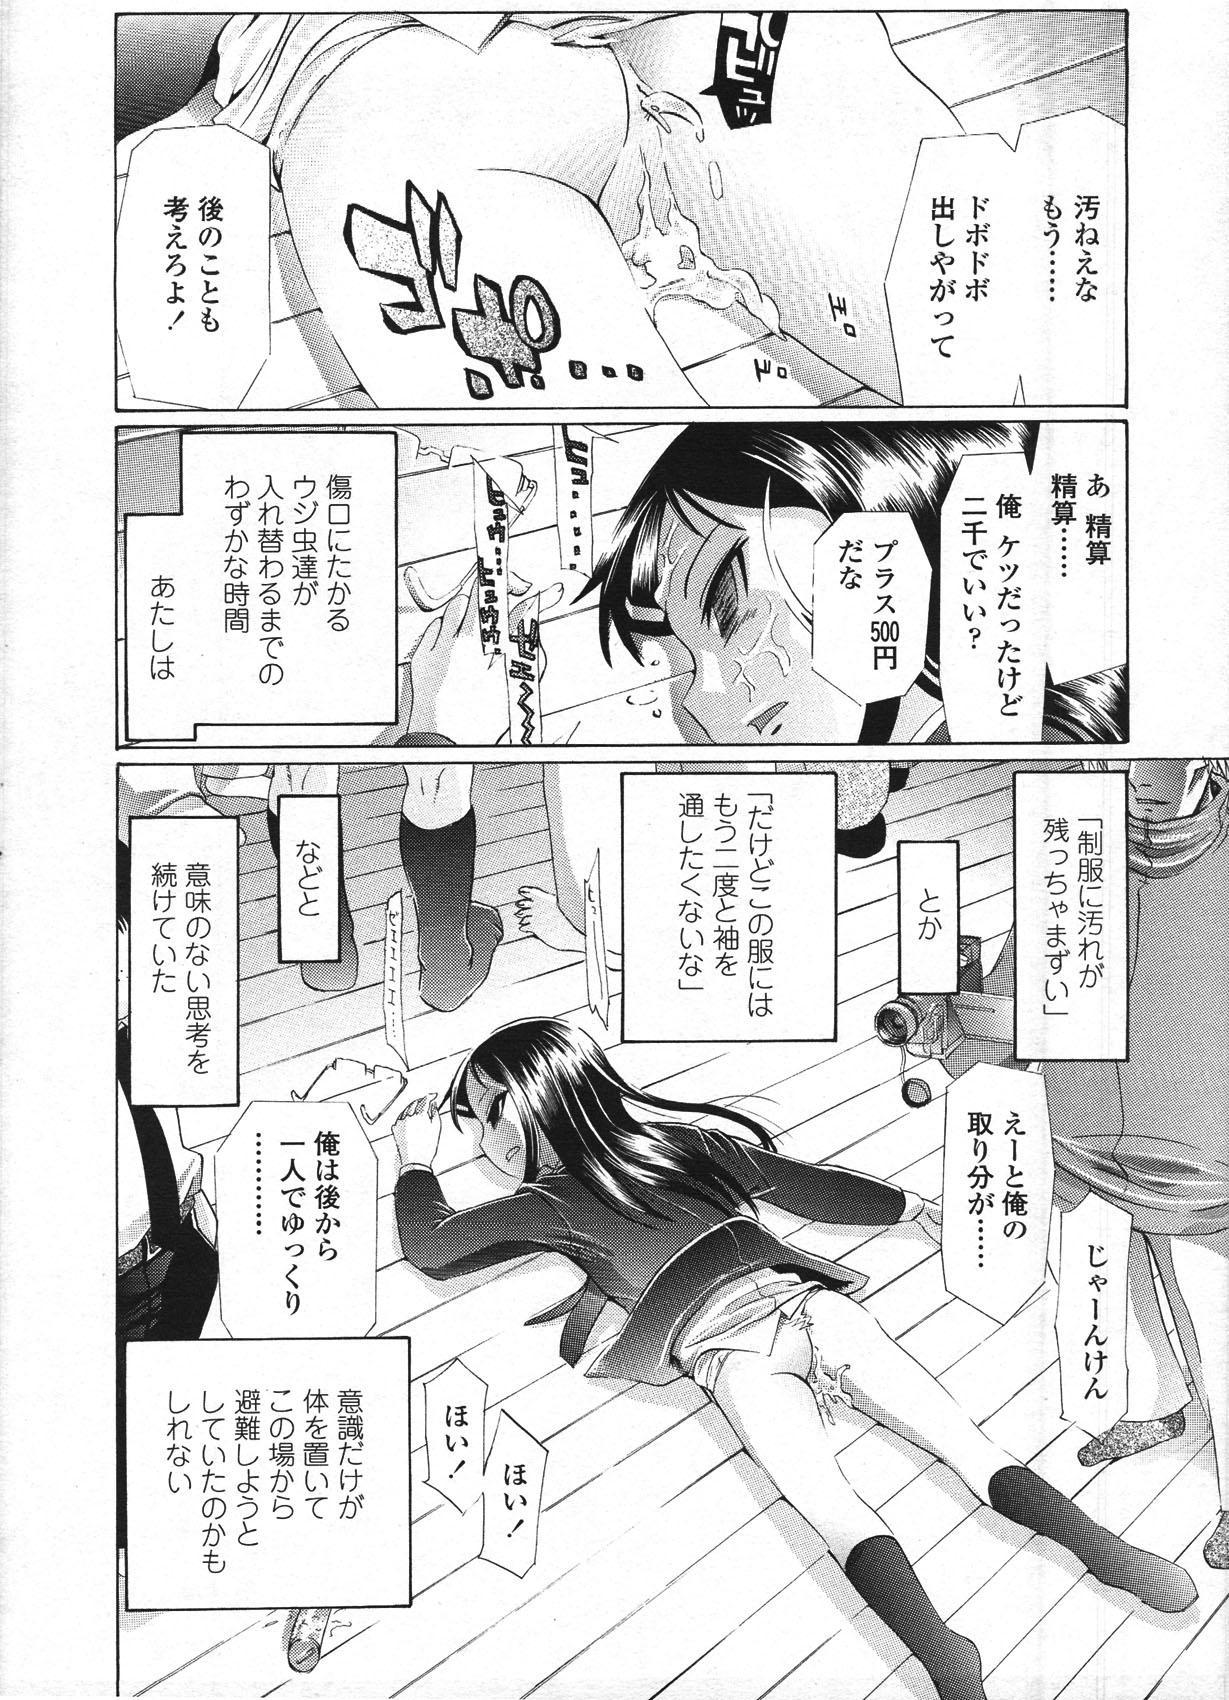 Comic LO 2009-04 Vol. 61 288